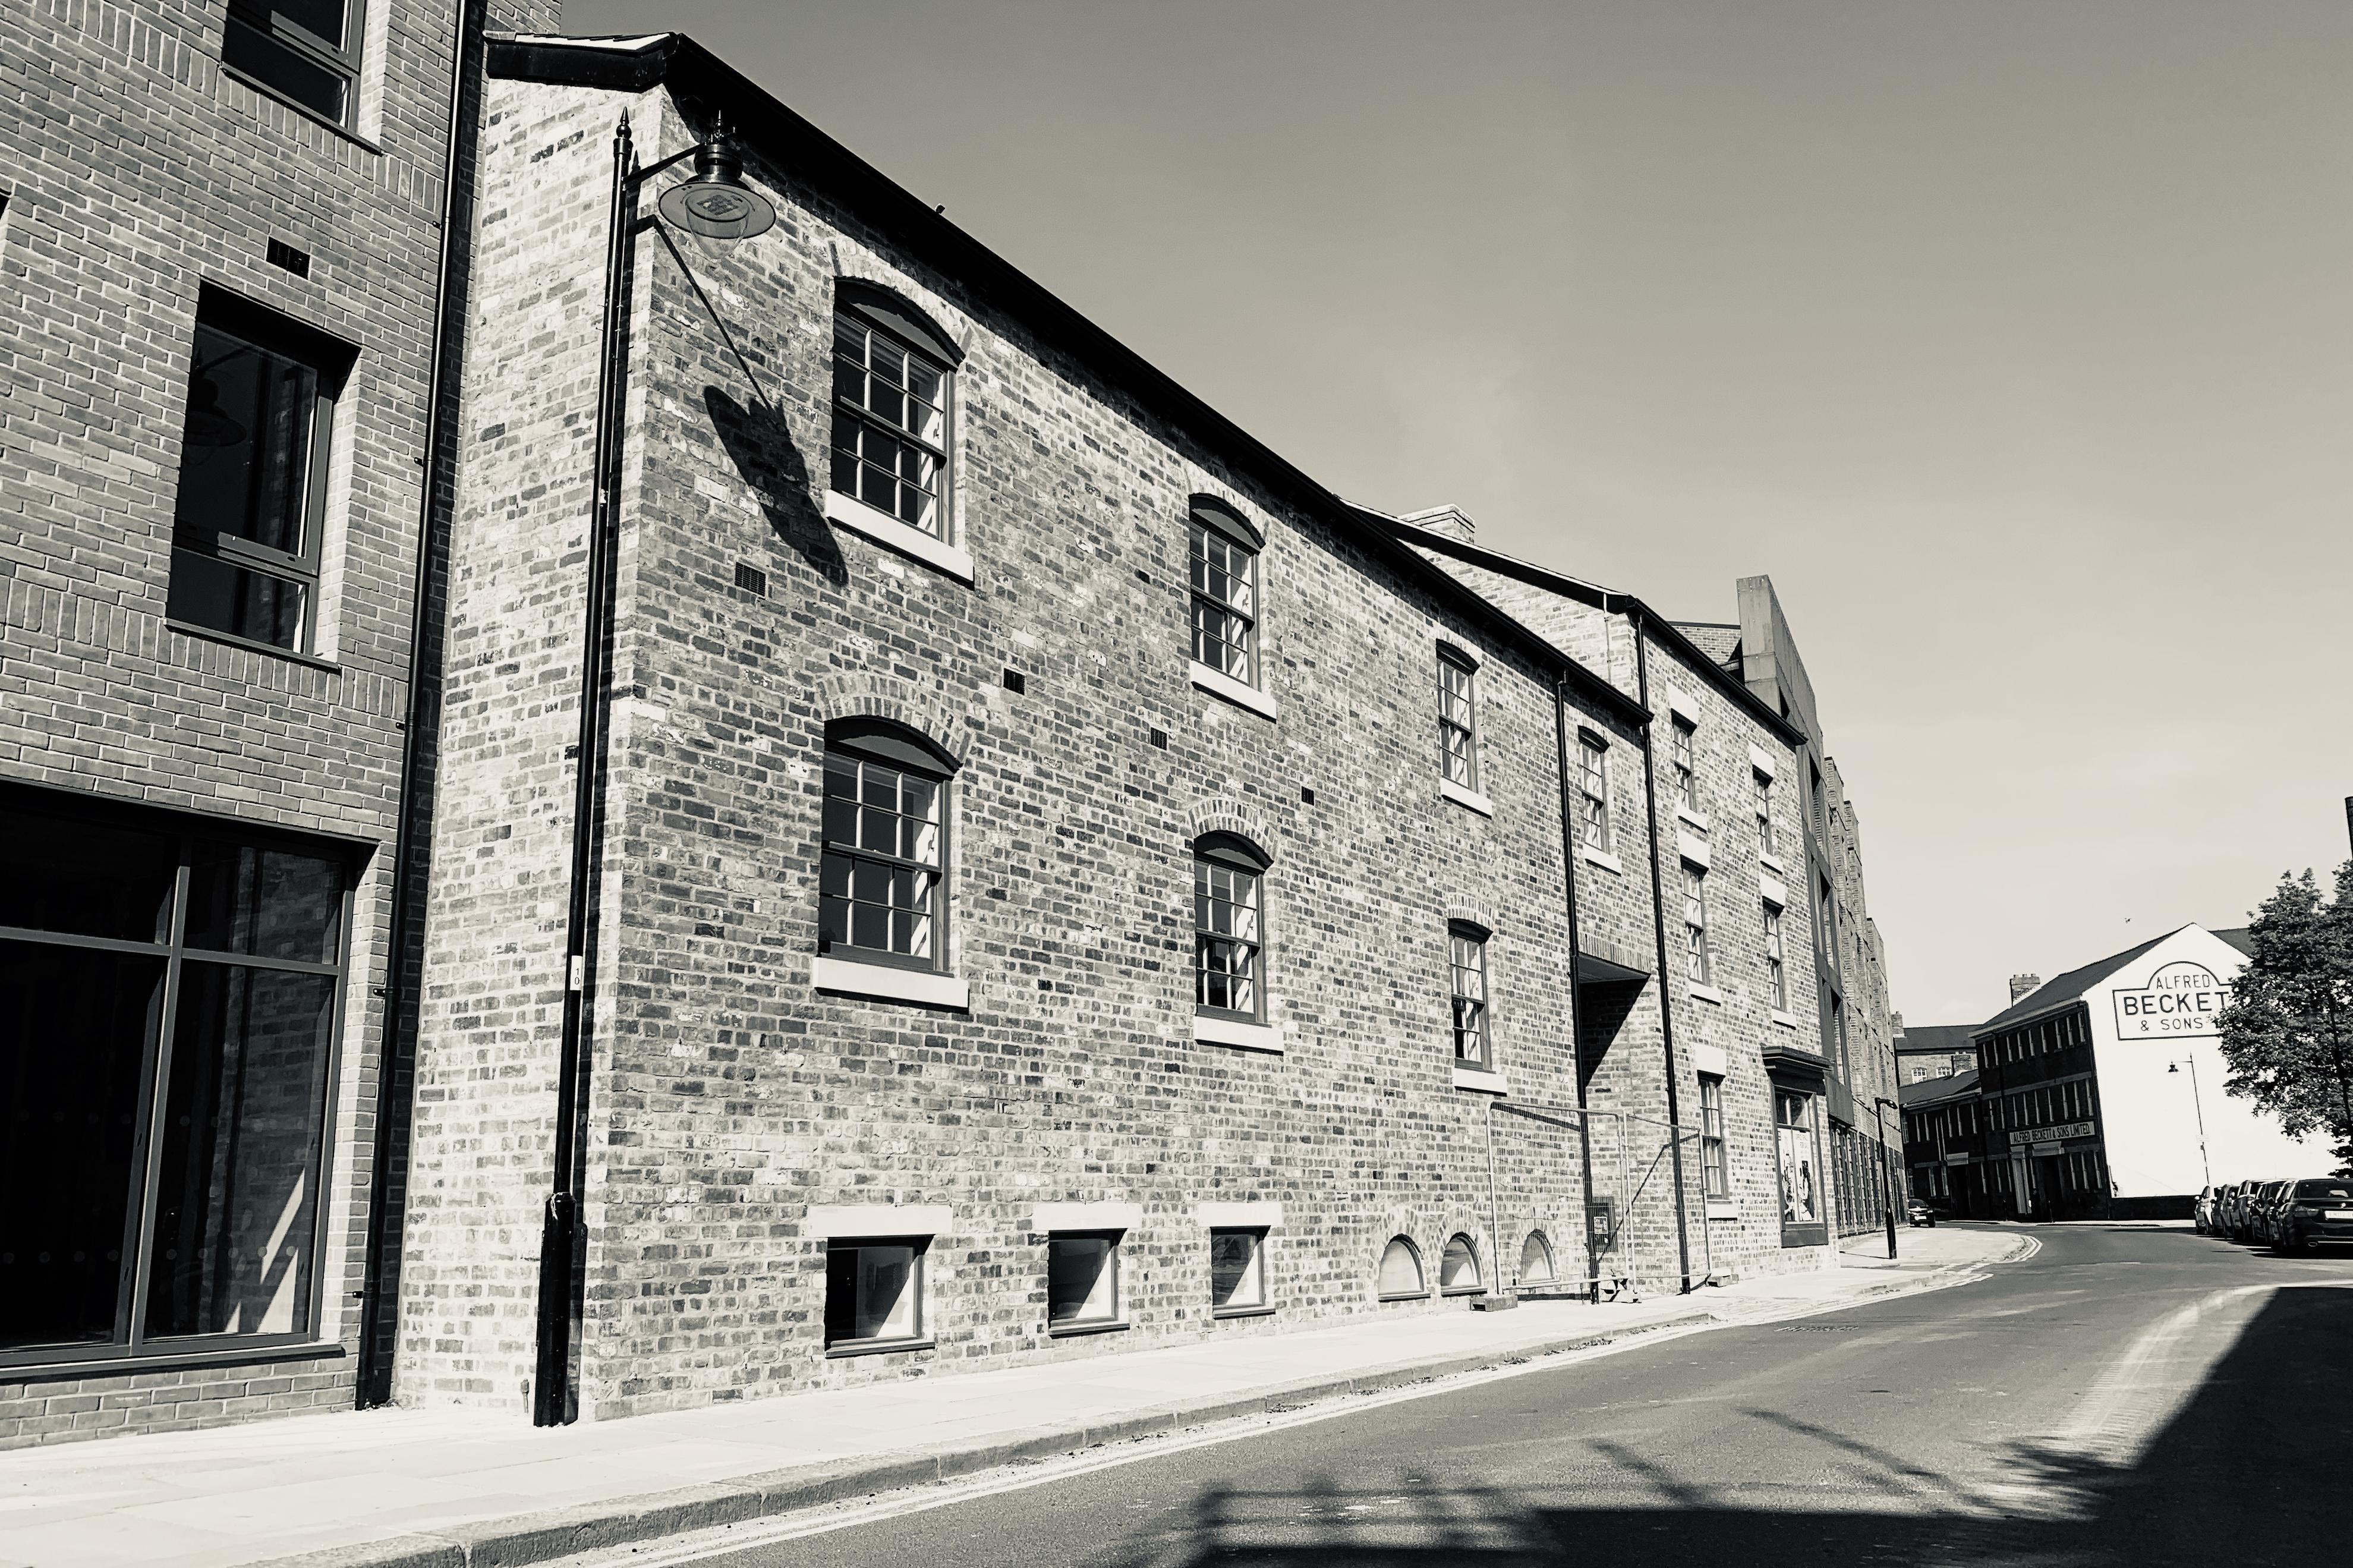 Dun Works, Green Lane, Sheffield, Offices For Sale - Dun - Summer 1.JPG